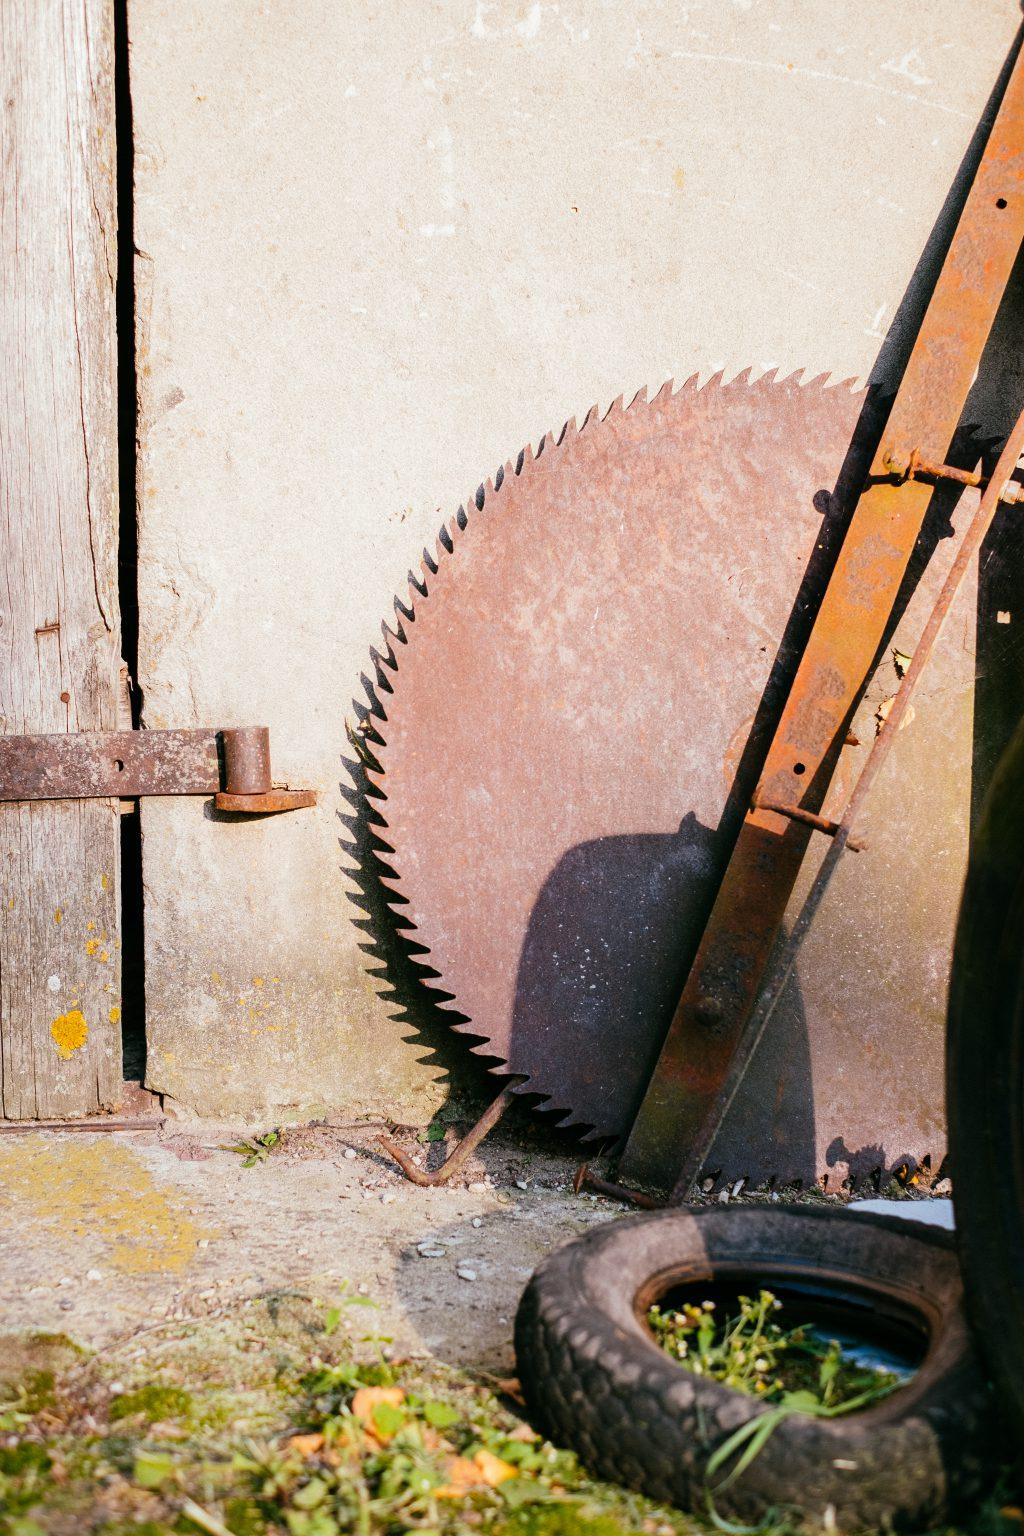 Old rusty saw blade - free stock photo